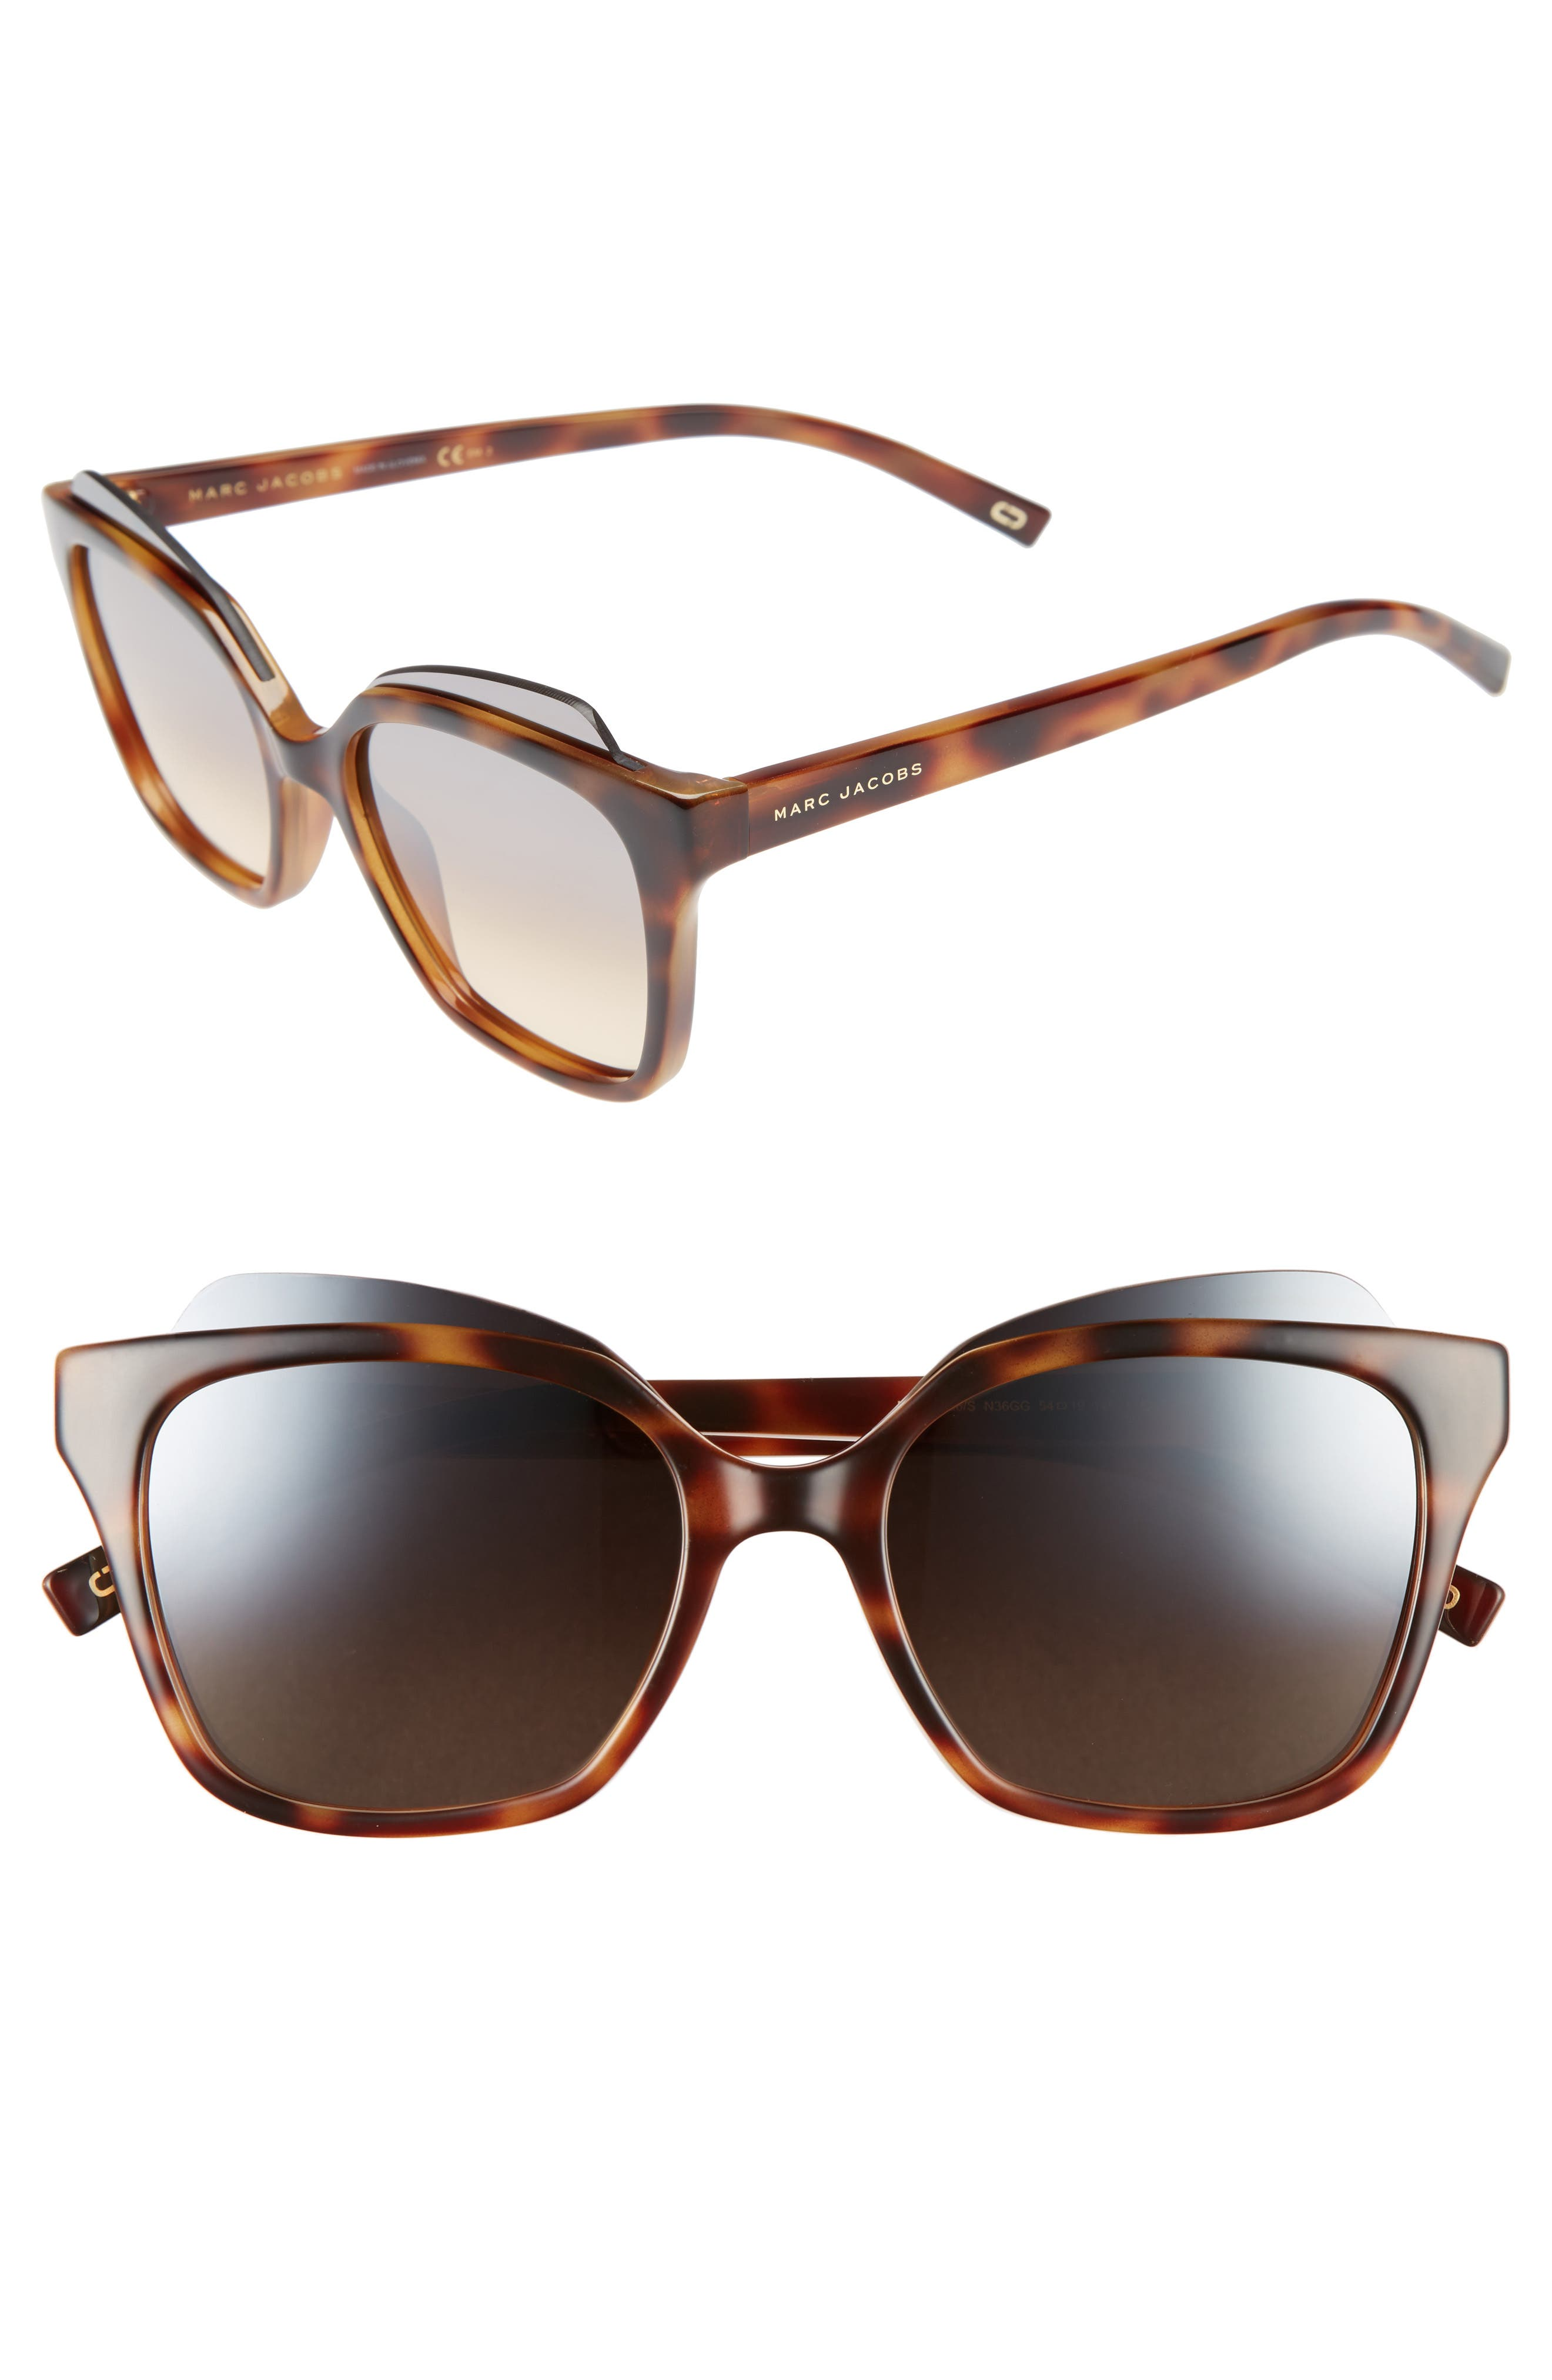 54mm Sunglasses,                         Main,                         color, Havana